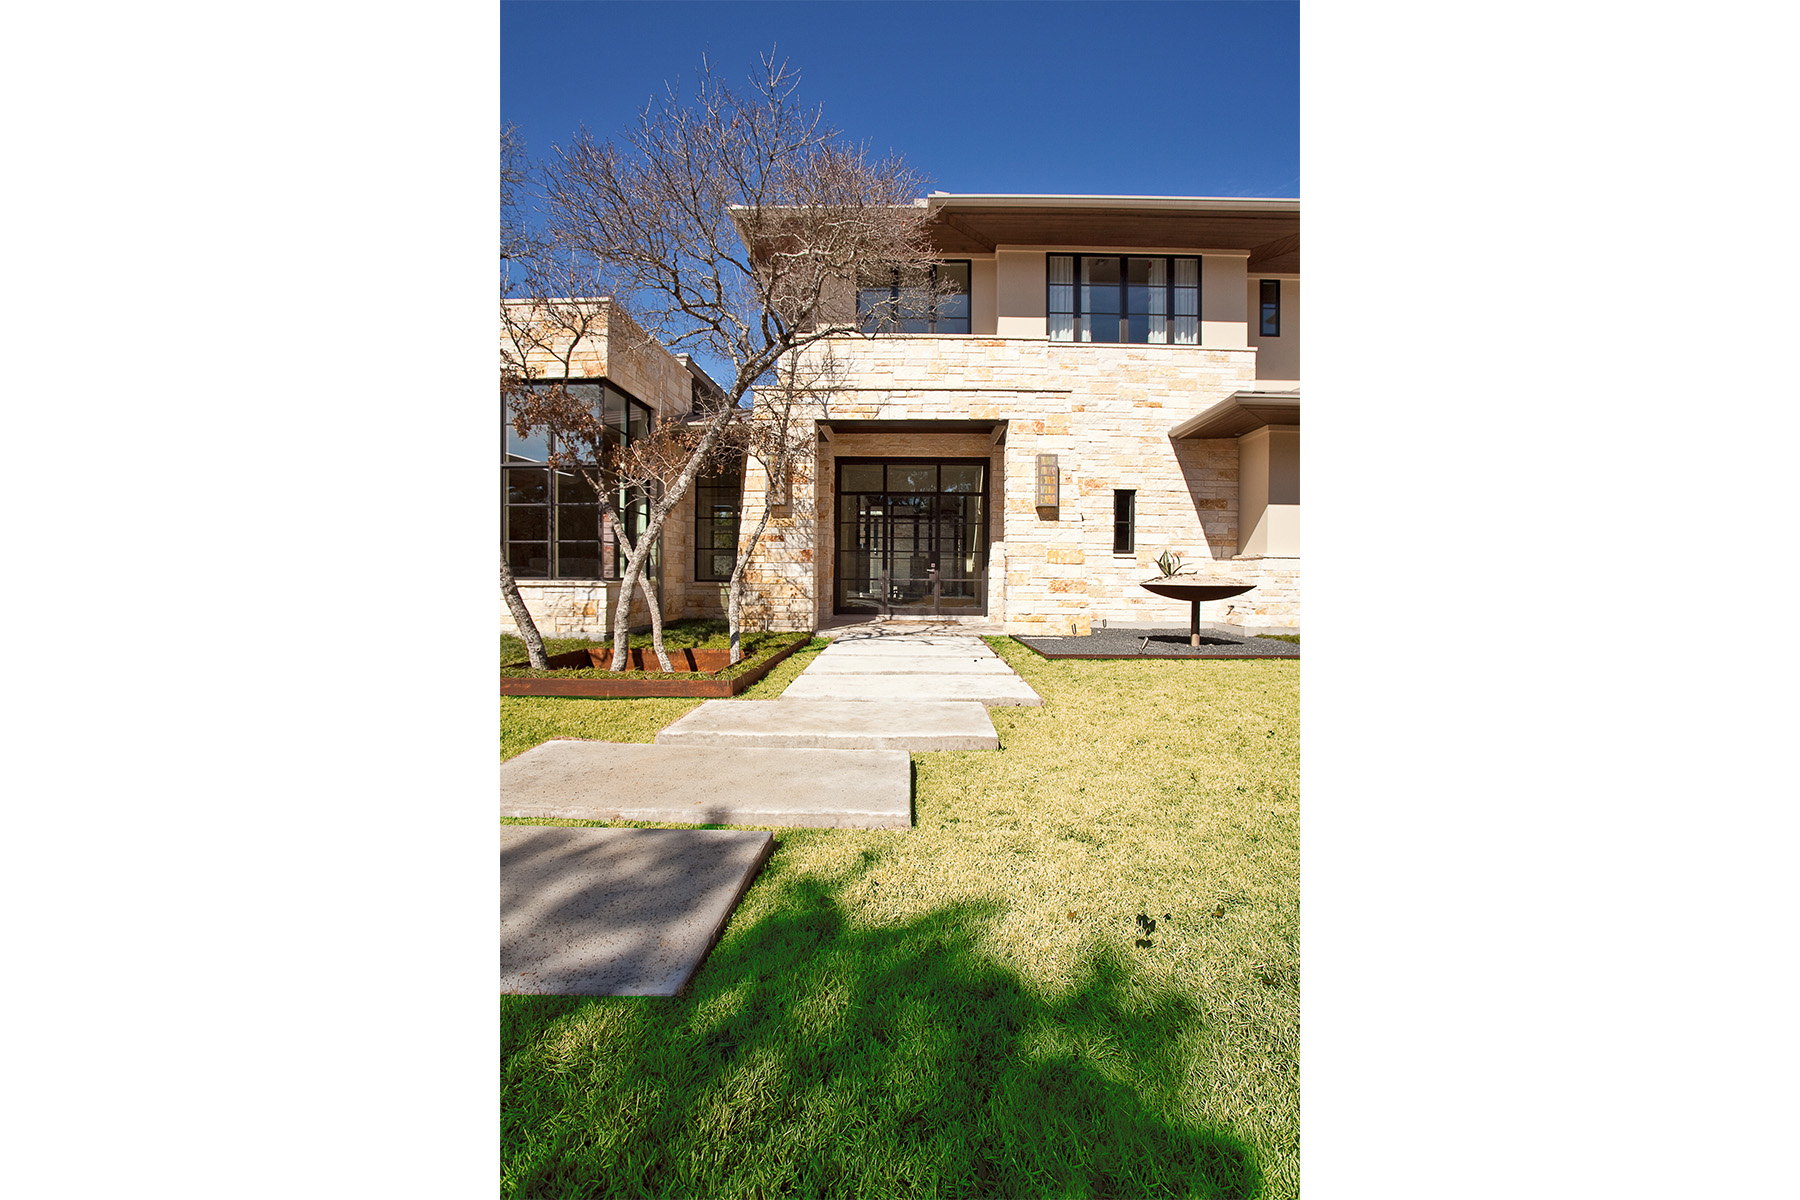 barton-creek-residence-front-entranc